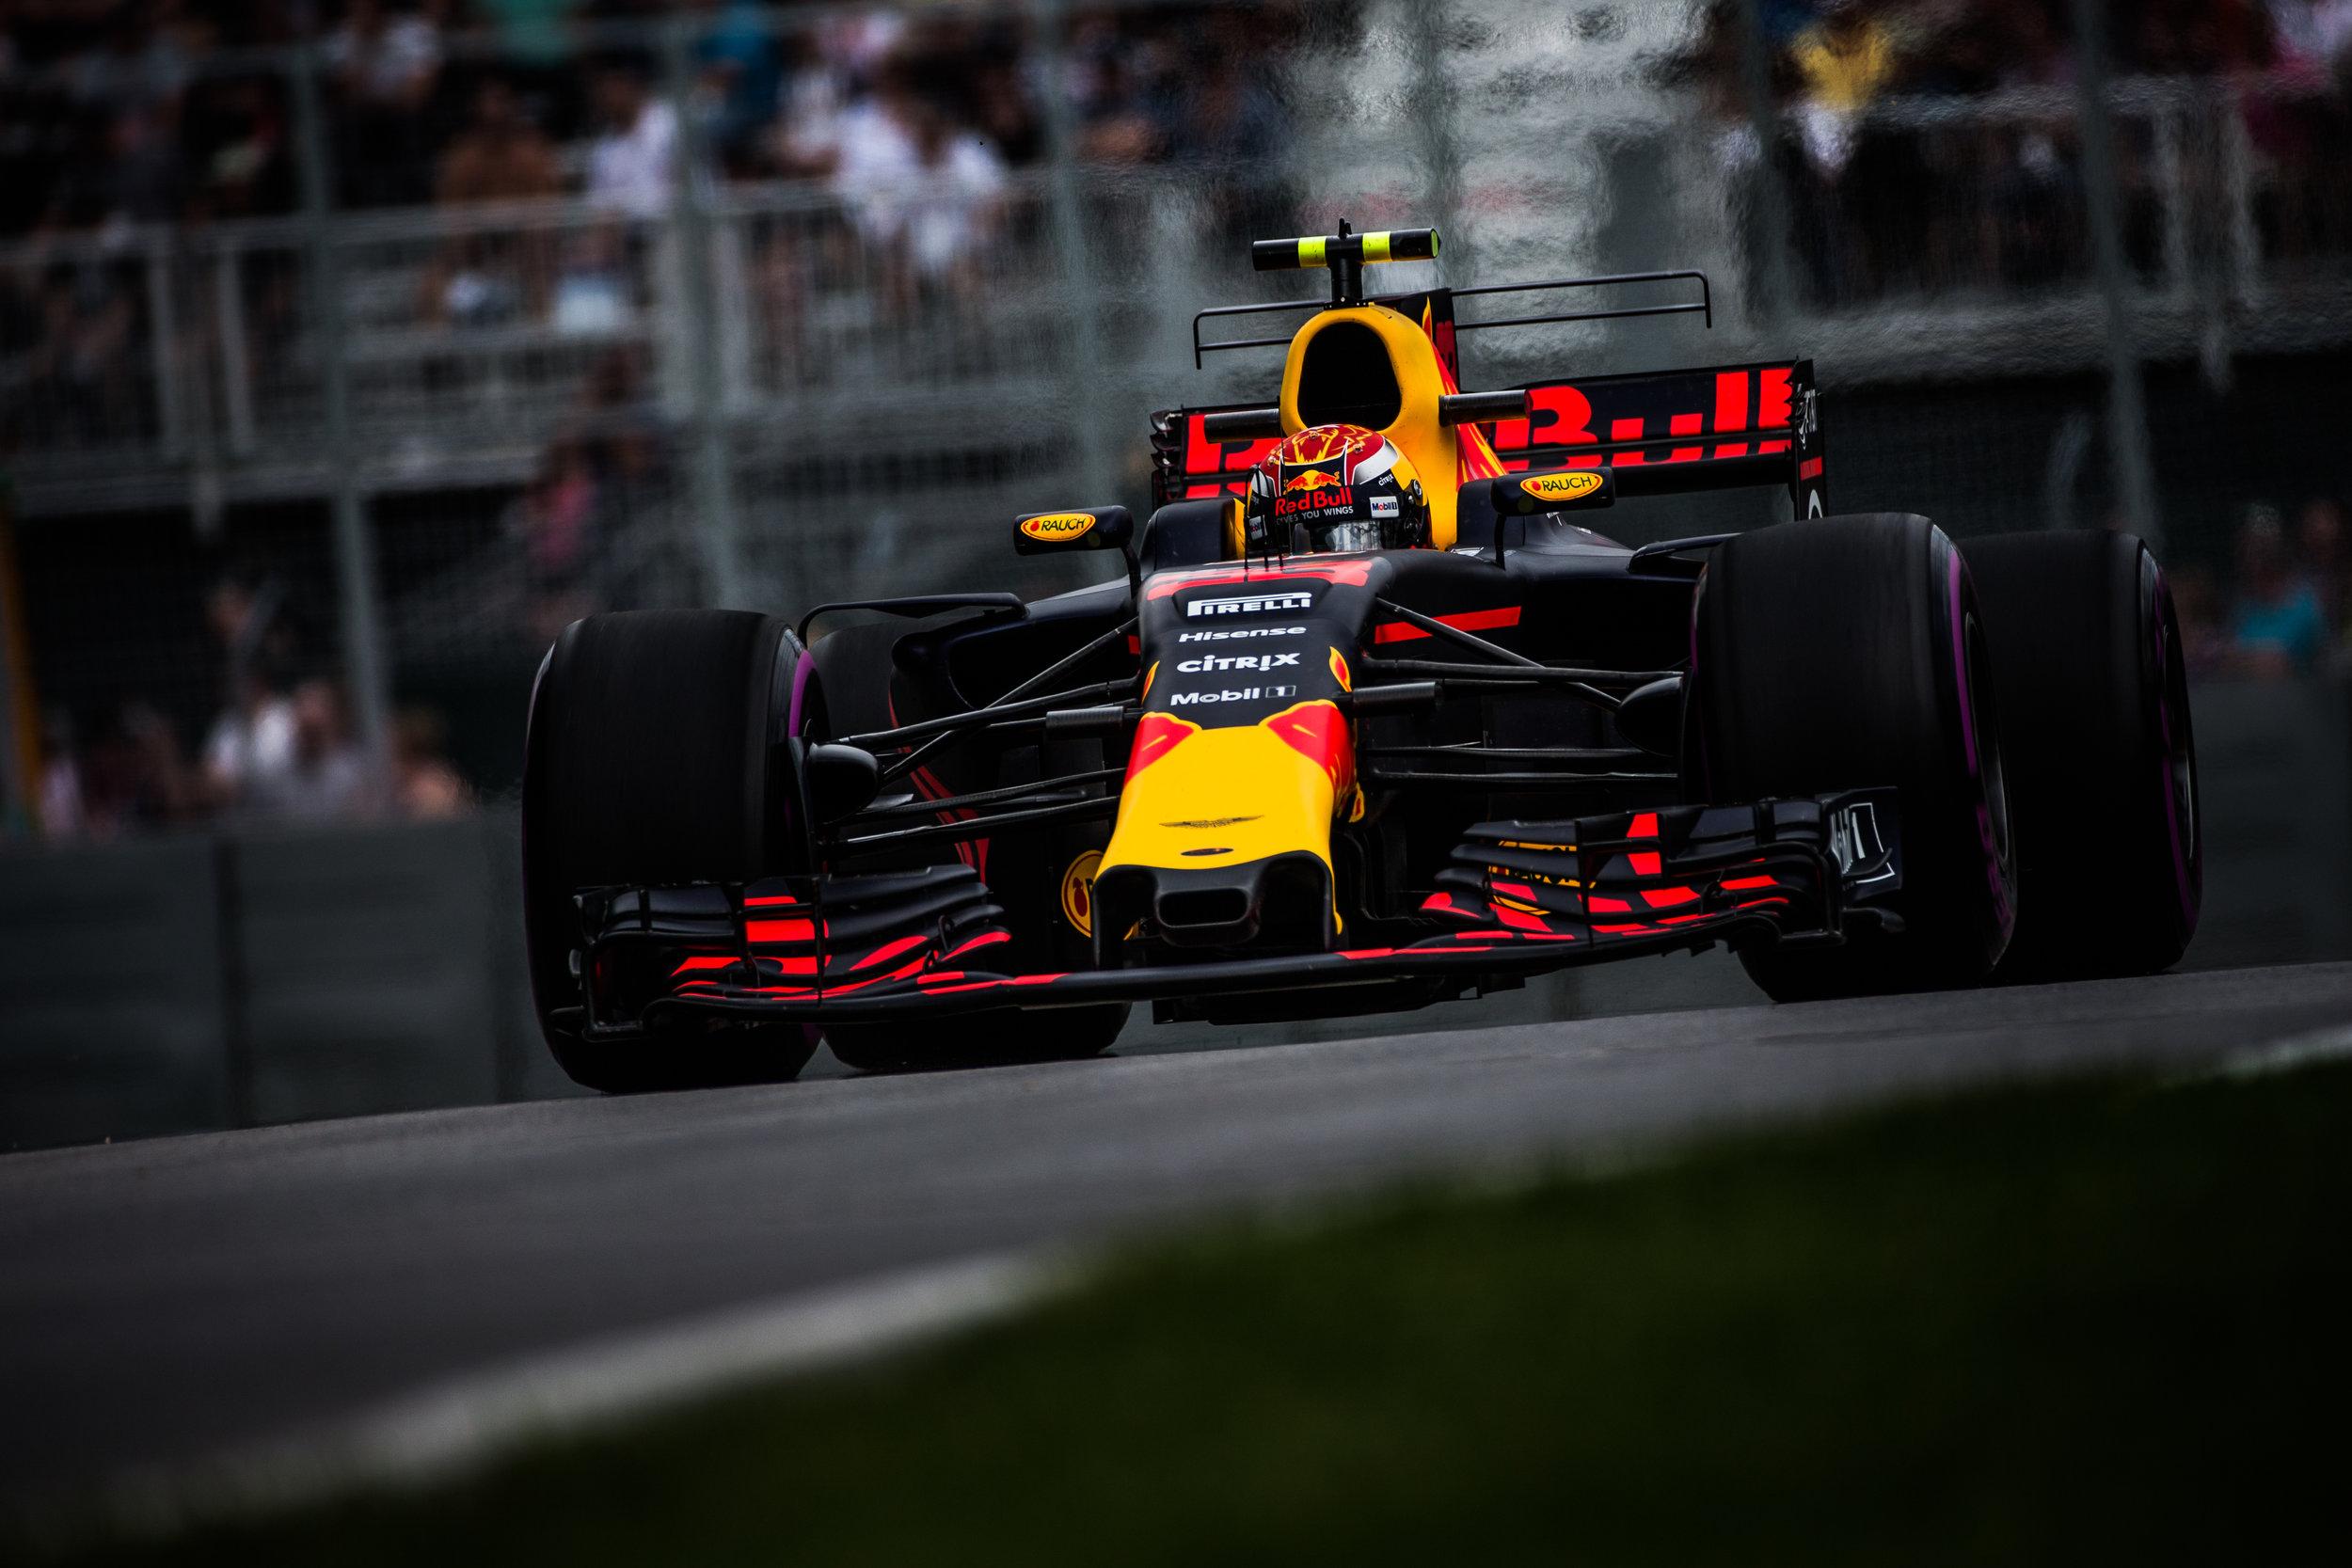 F1 Montreal 2017-9009.jpg